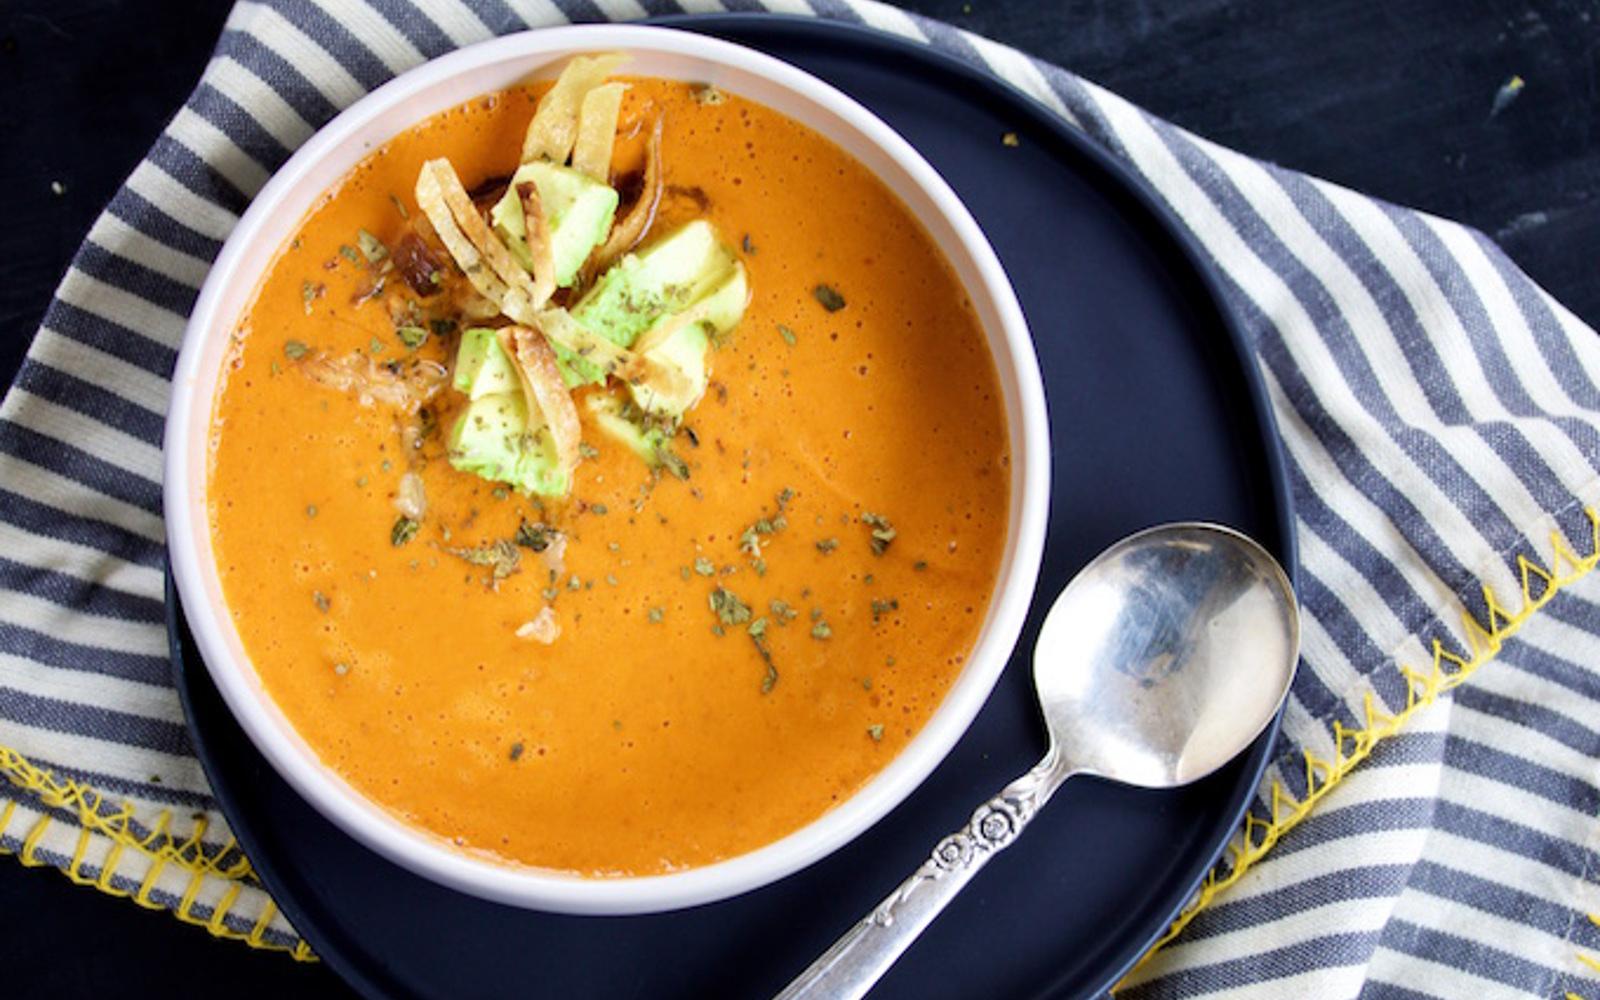 Creamy Chipotle Tomato Soup With Avocado